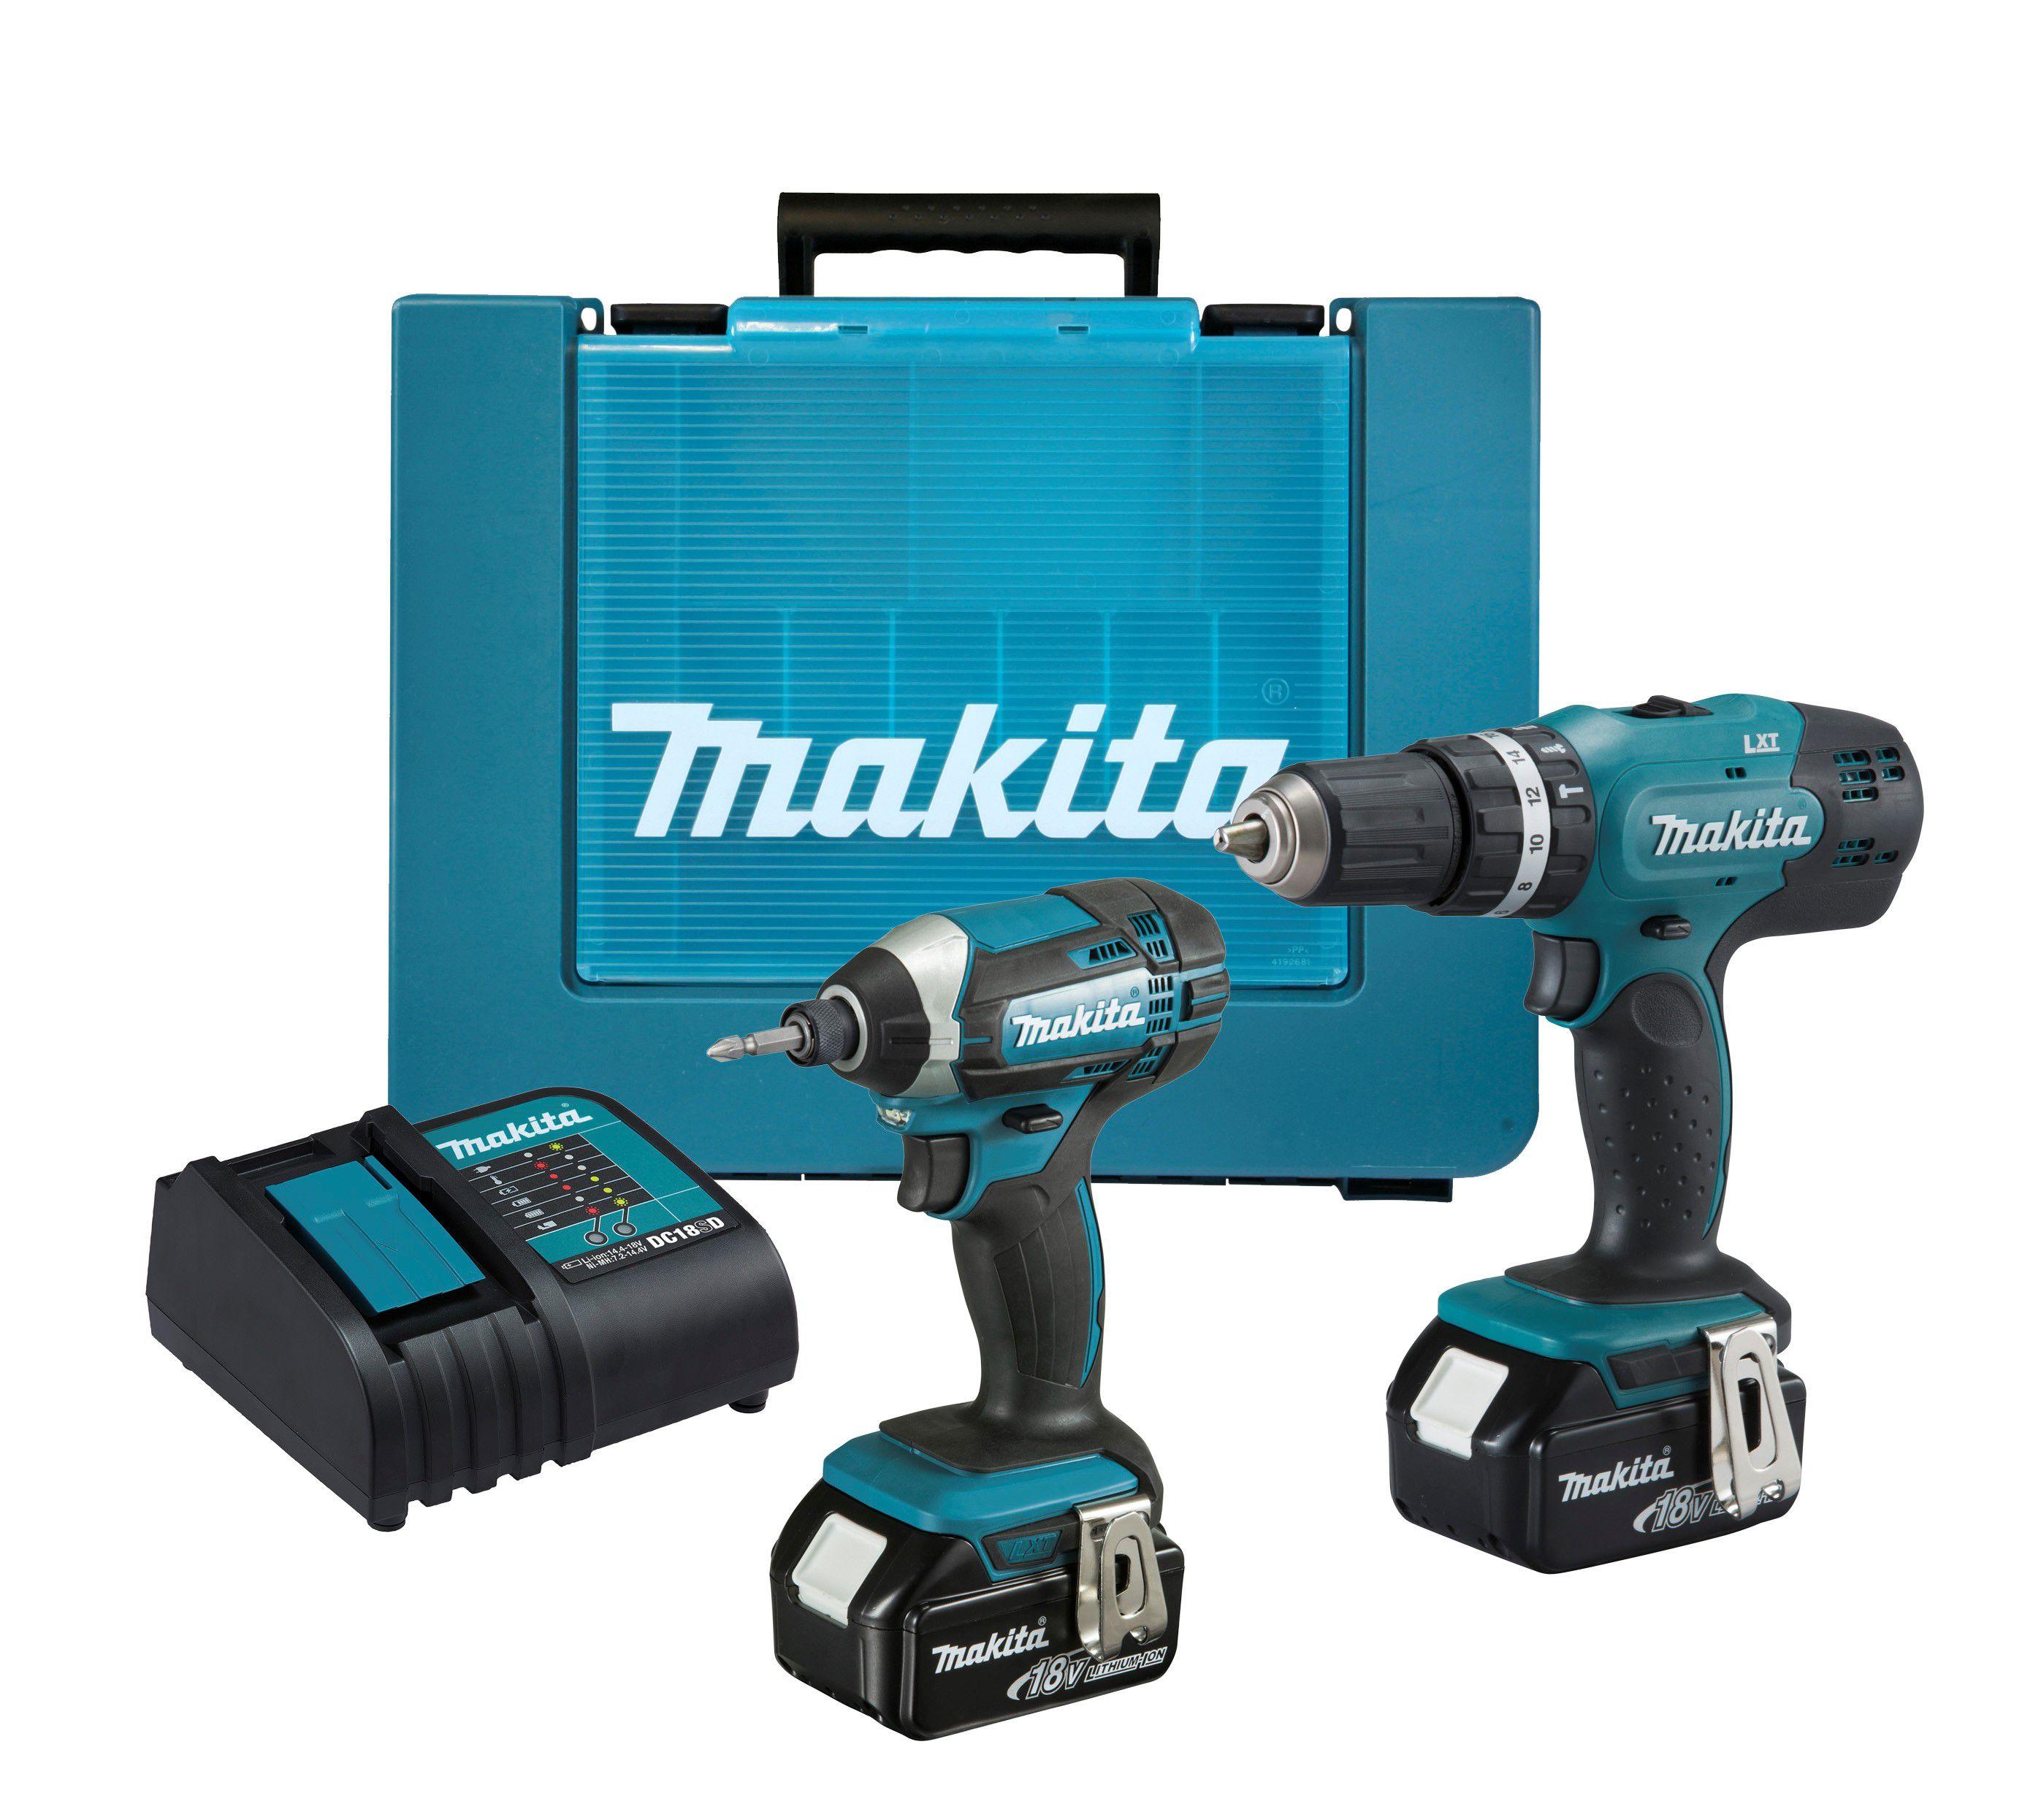 makita drill and impact driver 2 x 4ah 192 including vat. Black Bedroom Furniture Sets. Home Design Ideas